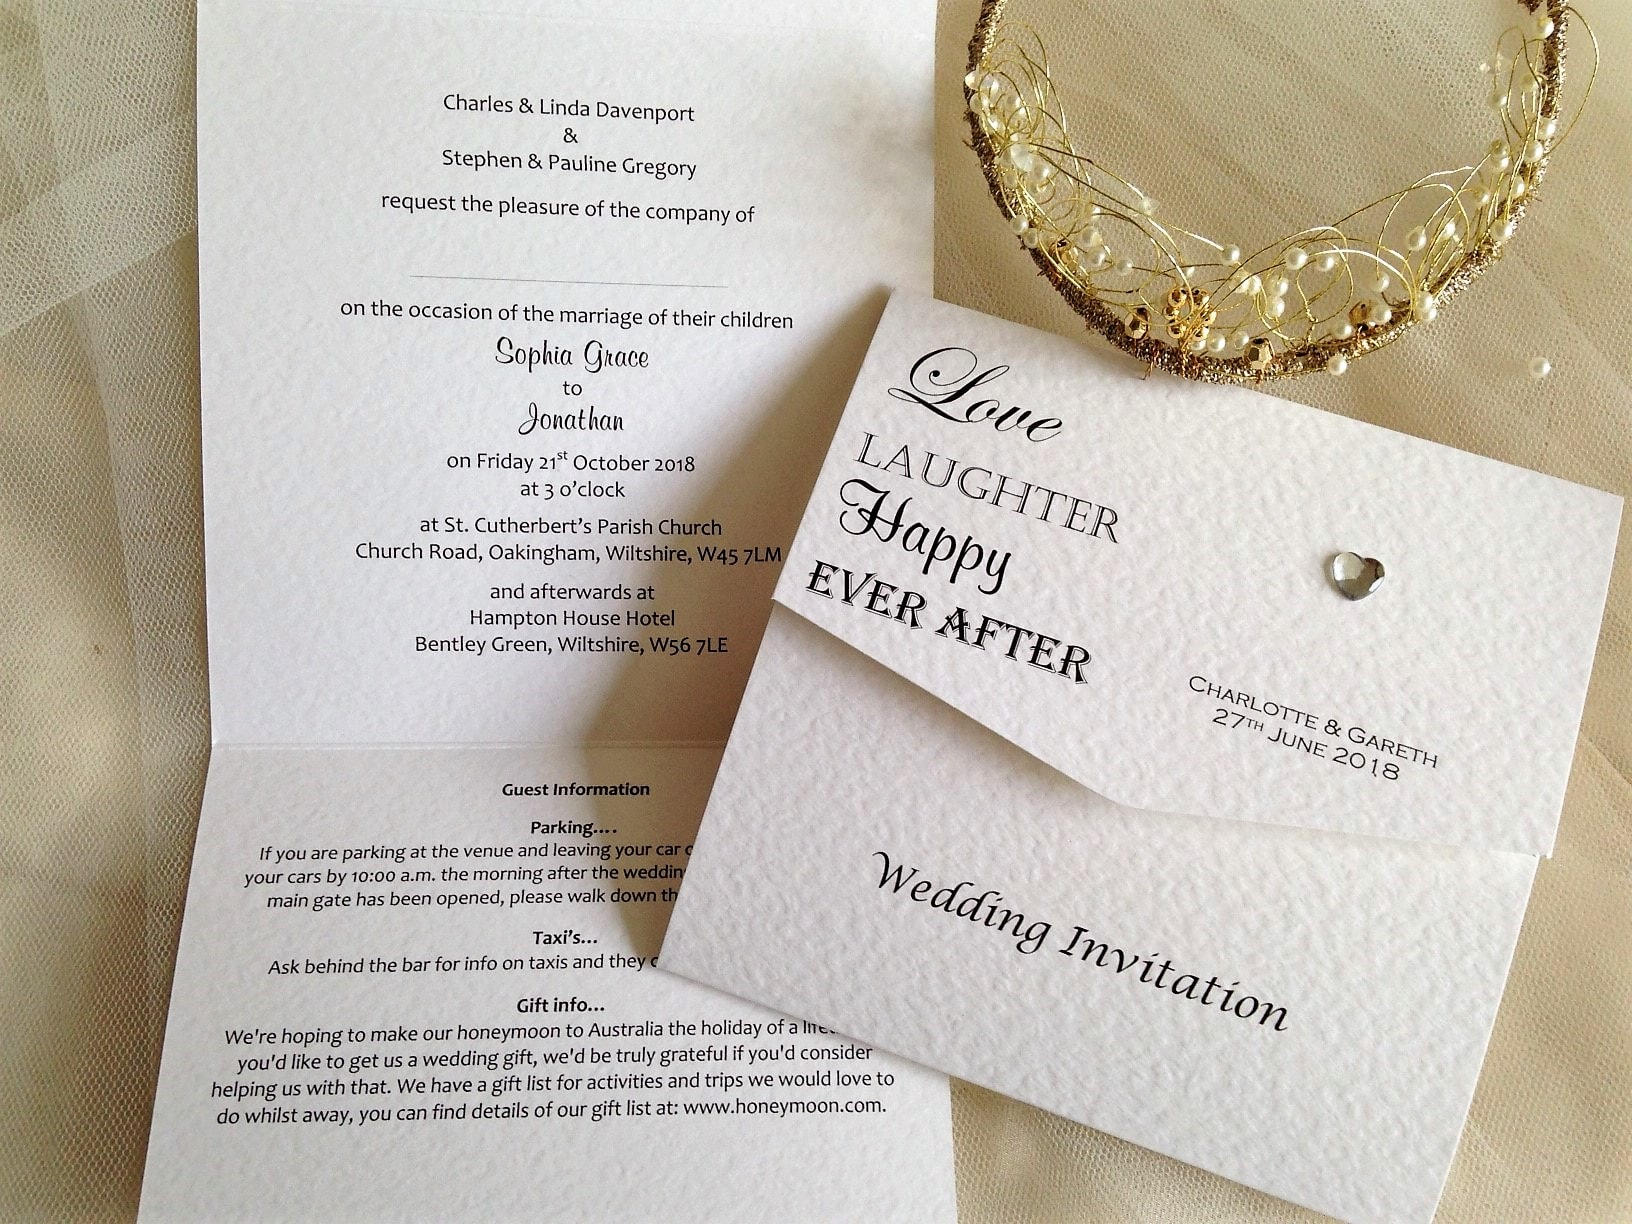 When Do You Order Wedding Invitations: Love Laughter Tri Fold Wedding Invitations £1.50